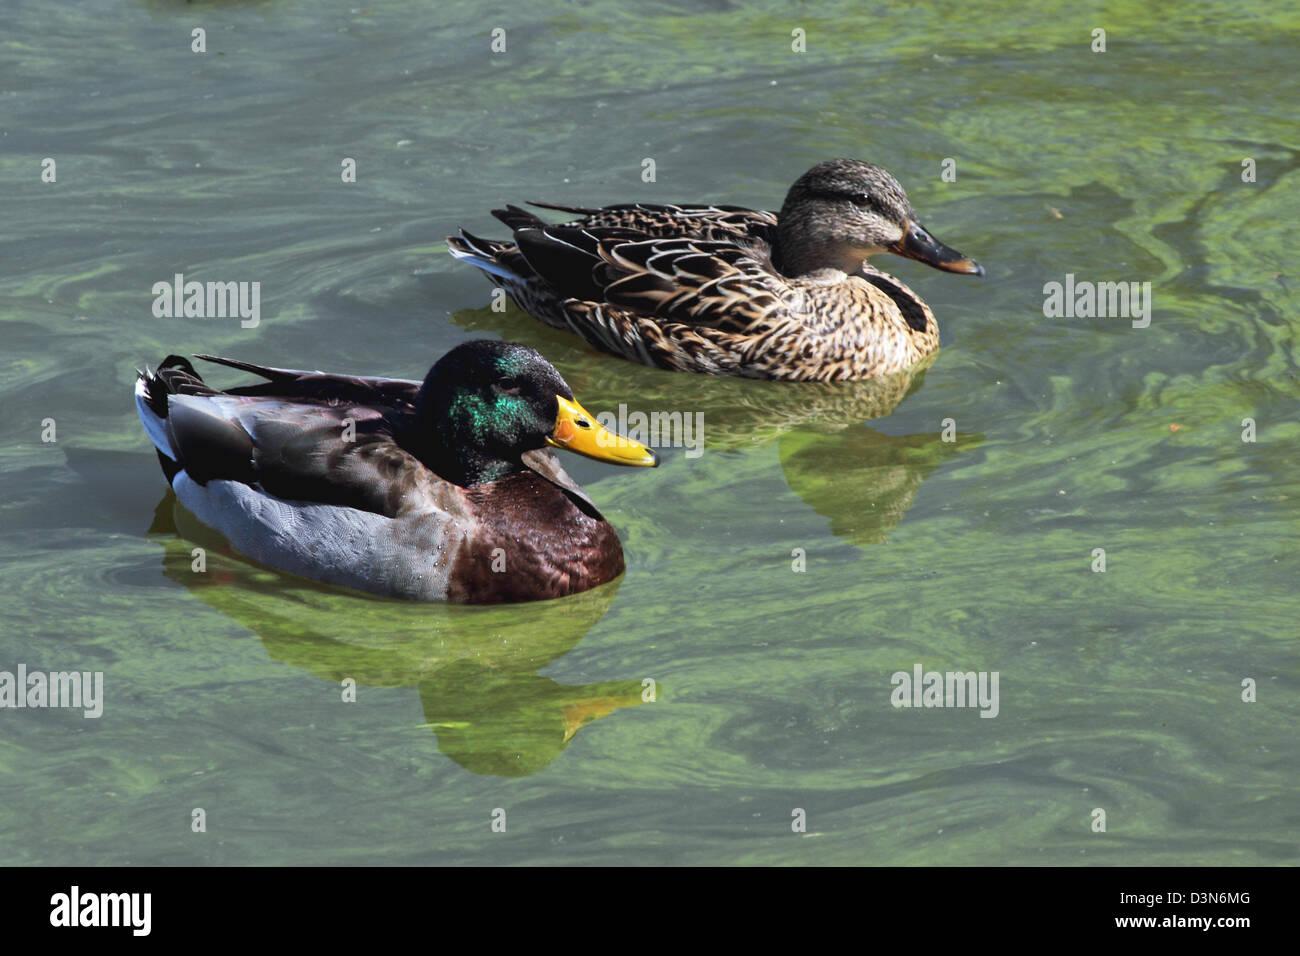 Two Mallard Ducks A Male And Female Swim On An Algae Covered Pond